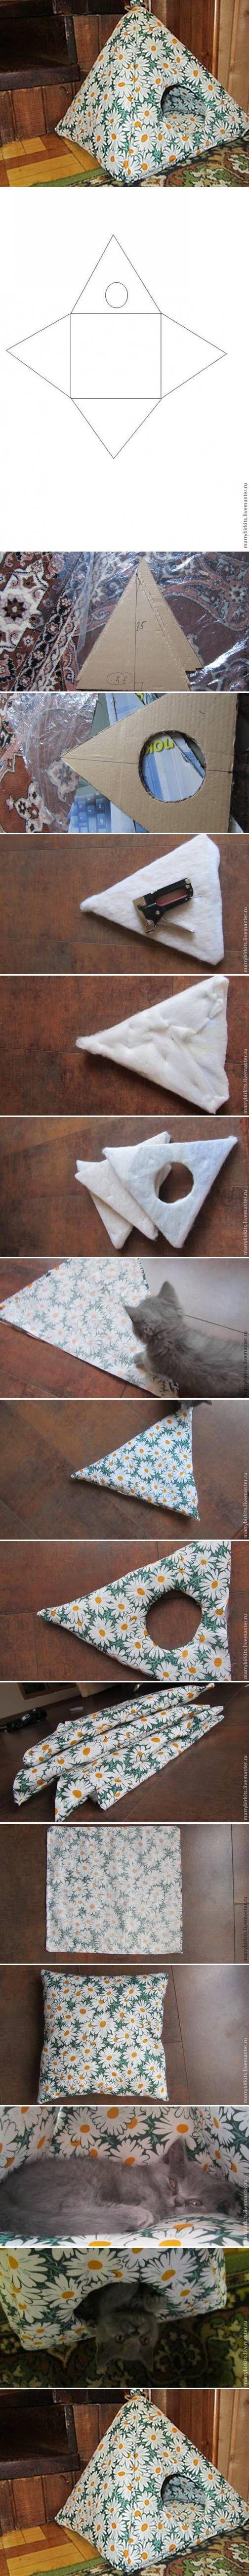 DIY House for Cat DIY Projects | UsefulDIY.com Follow Us on Facebook --> https://www.facebook.com/UsefulDiy